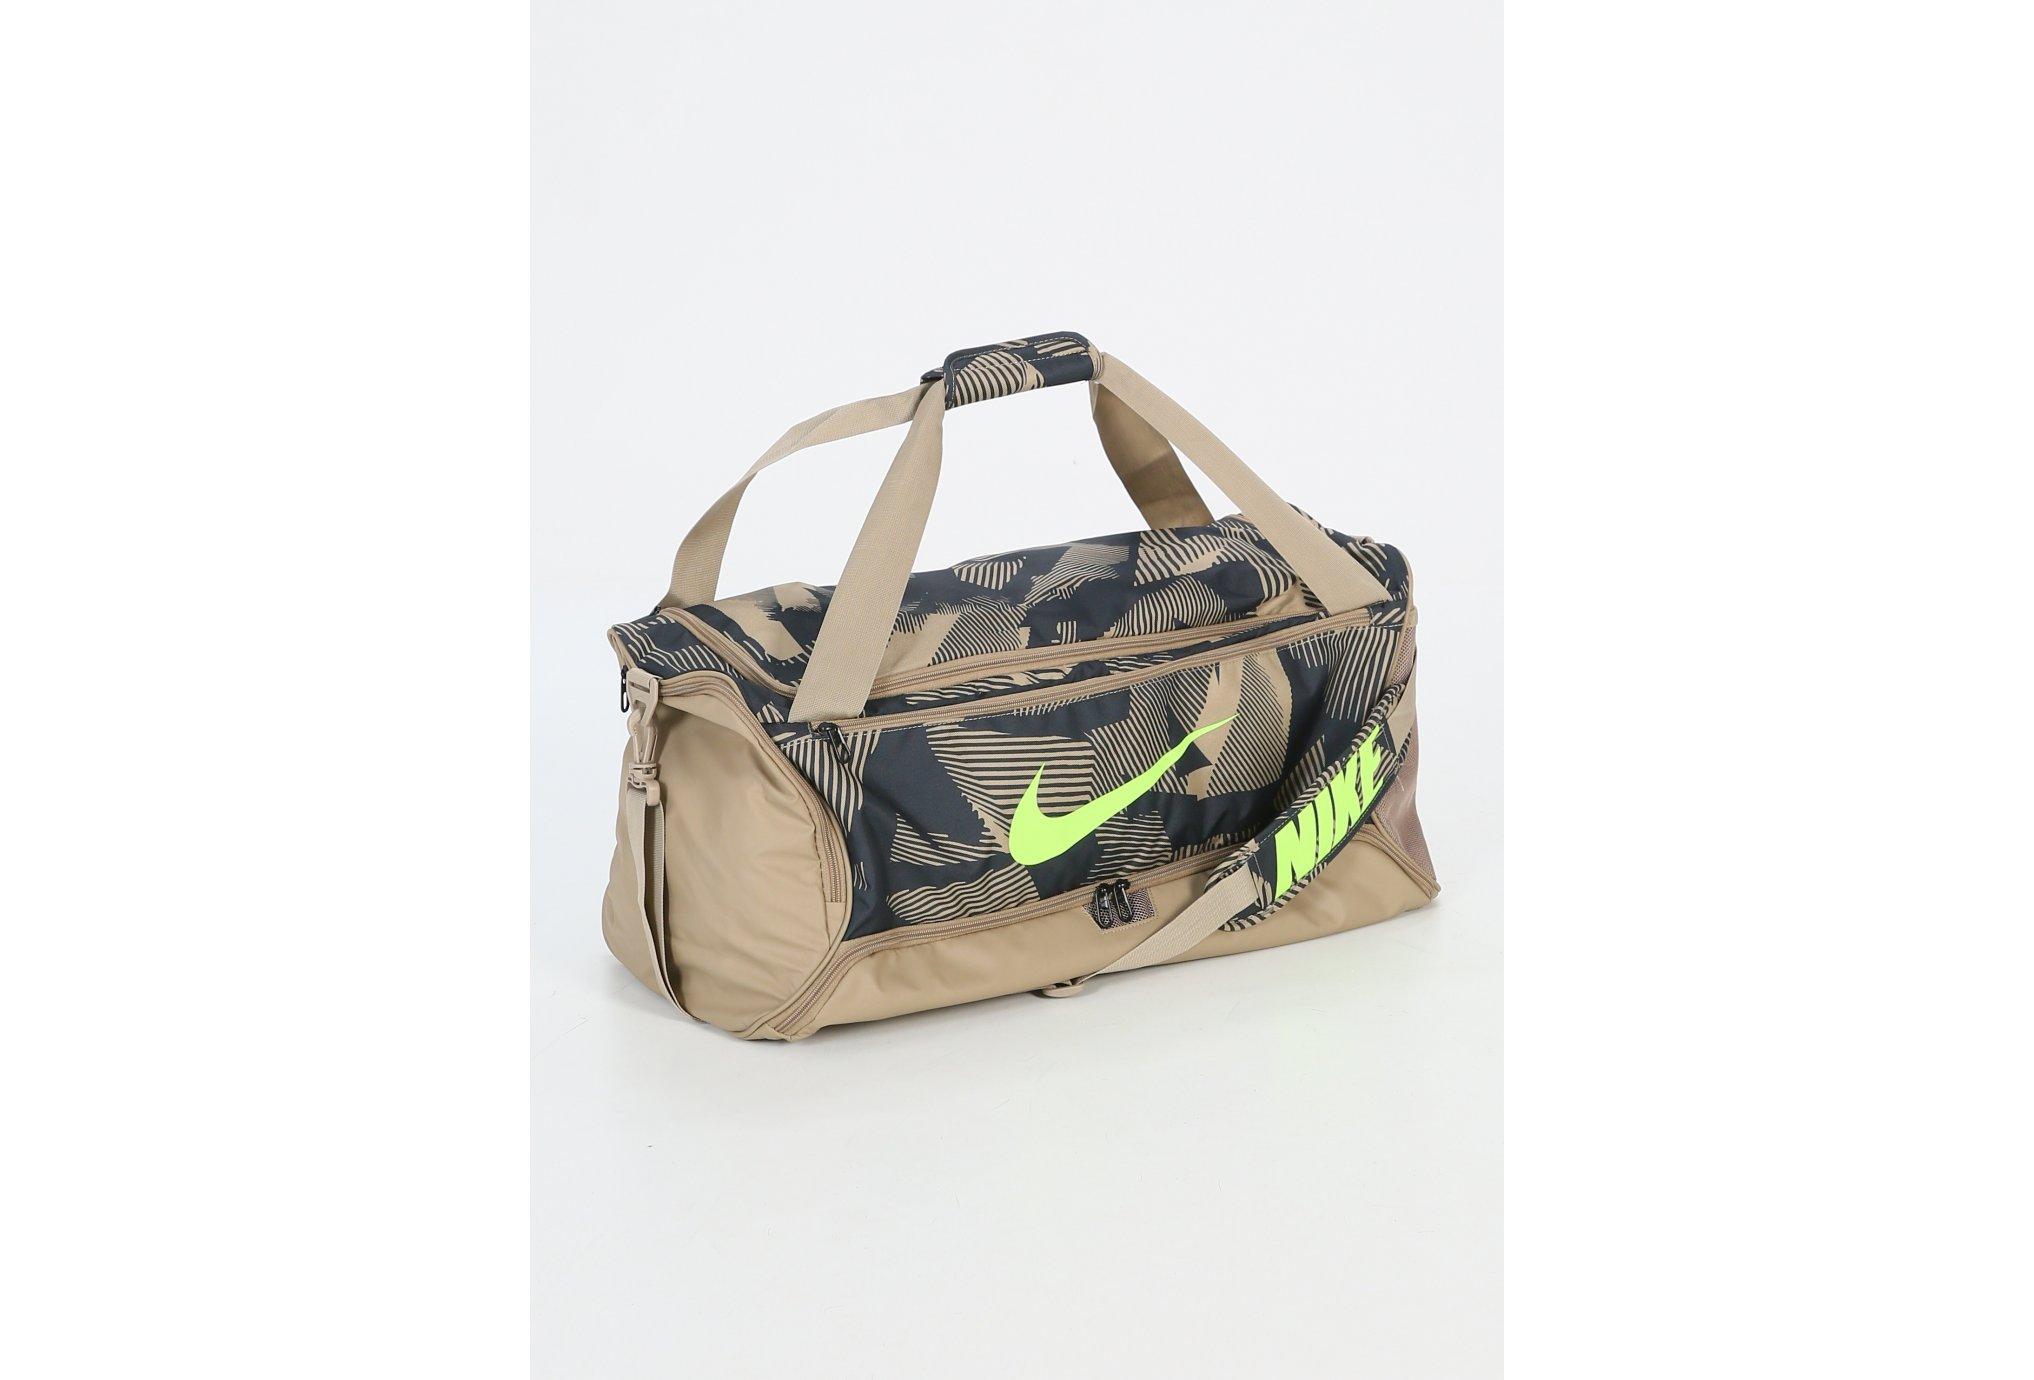 Nike Brasilia duffel 9.0 aop - m sac de sport